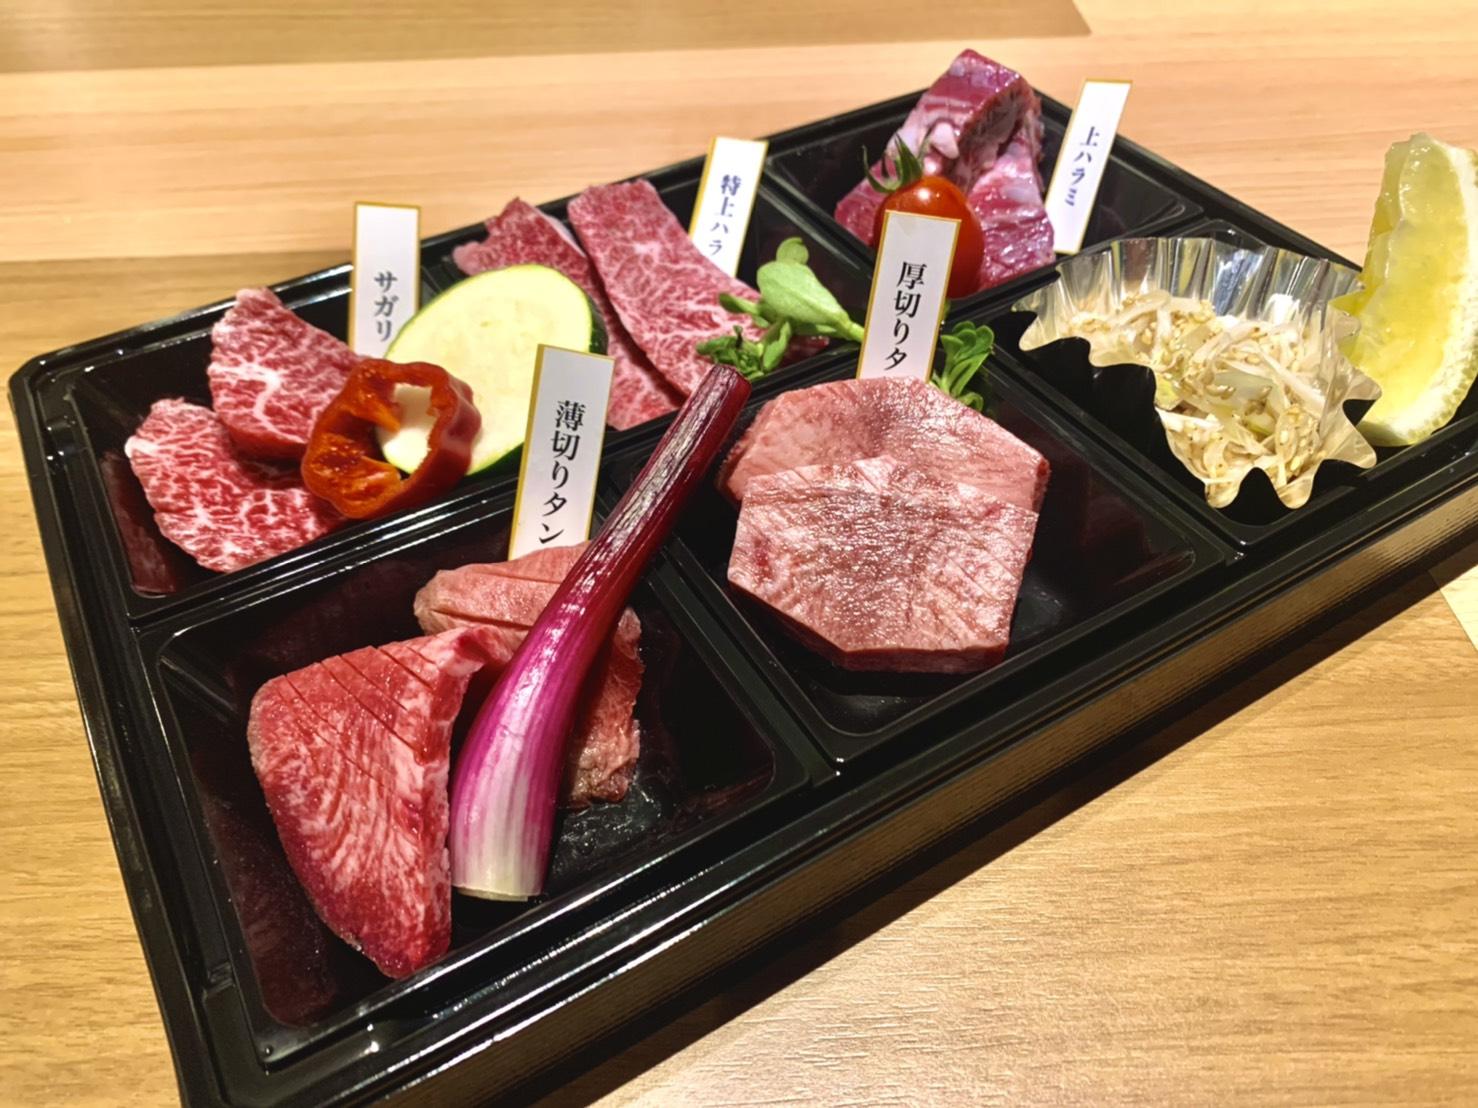 BISTRO山城牛厳選定番タン&ハラミ焼肉セット(1人前)